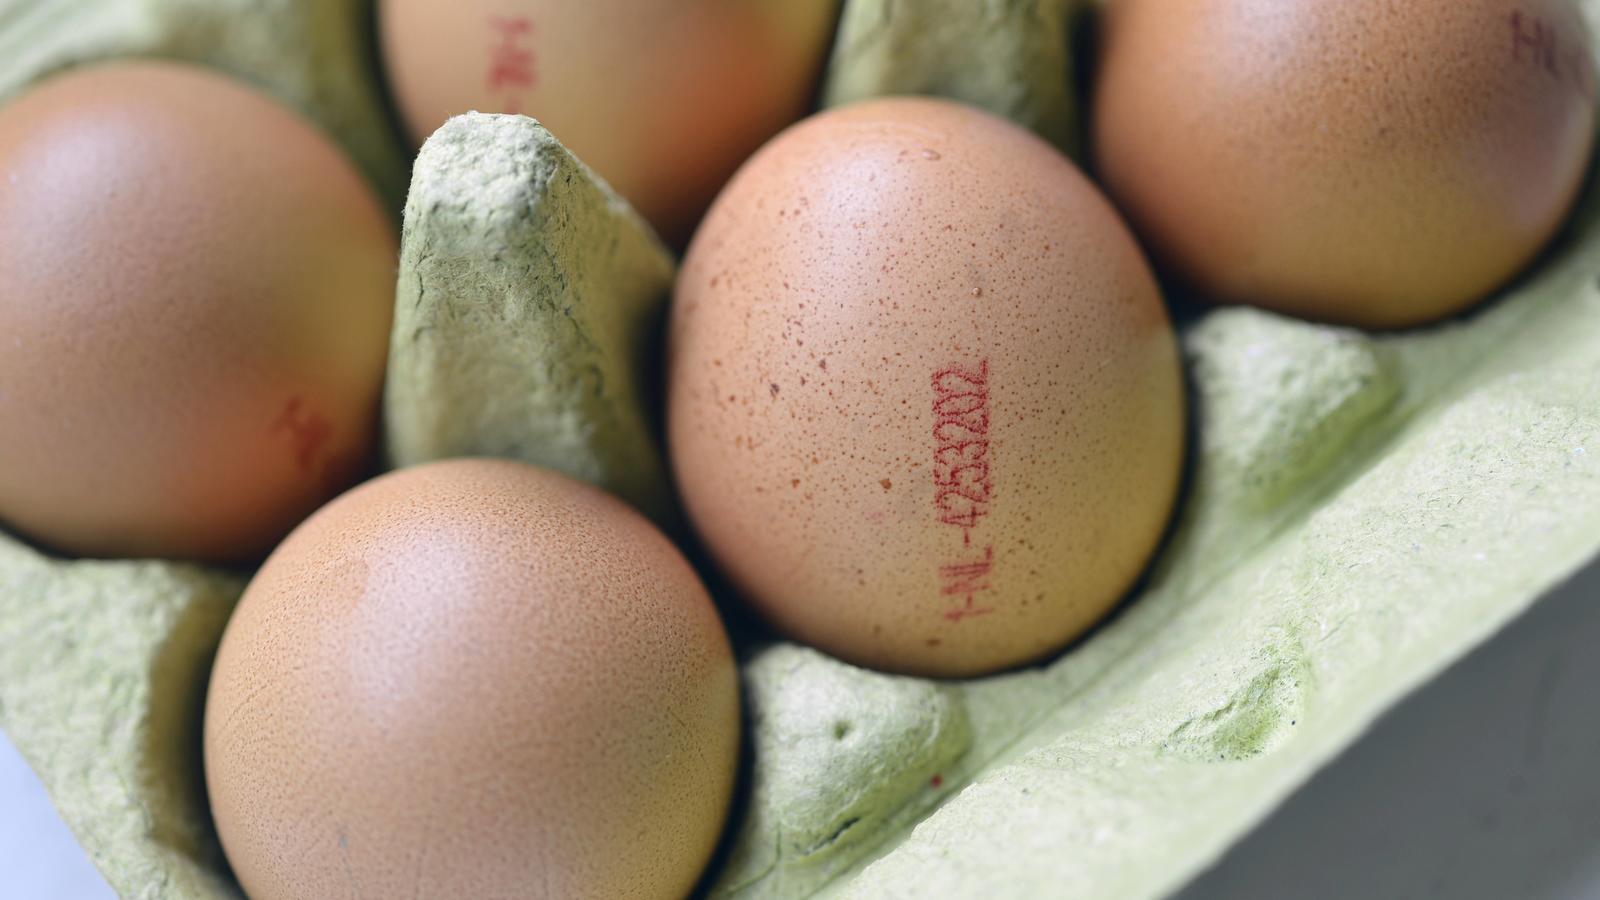 Fipronil-Eier: Nun ermittelt die Justiz class=